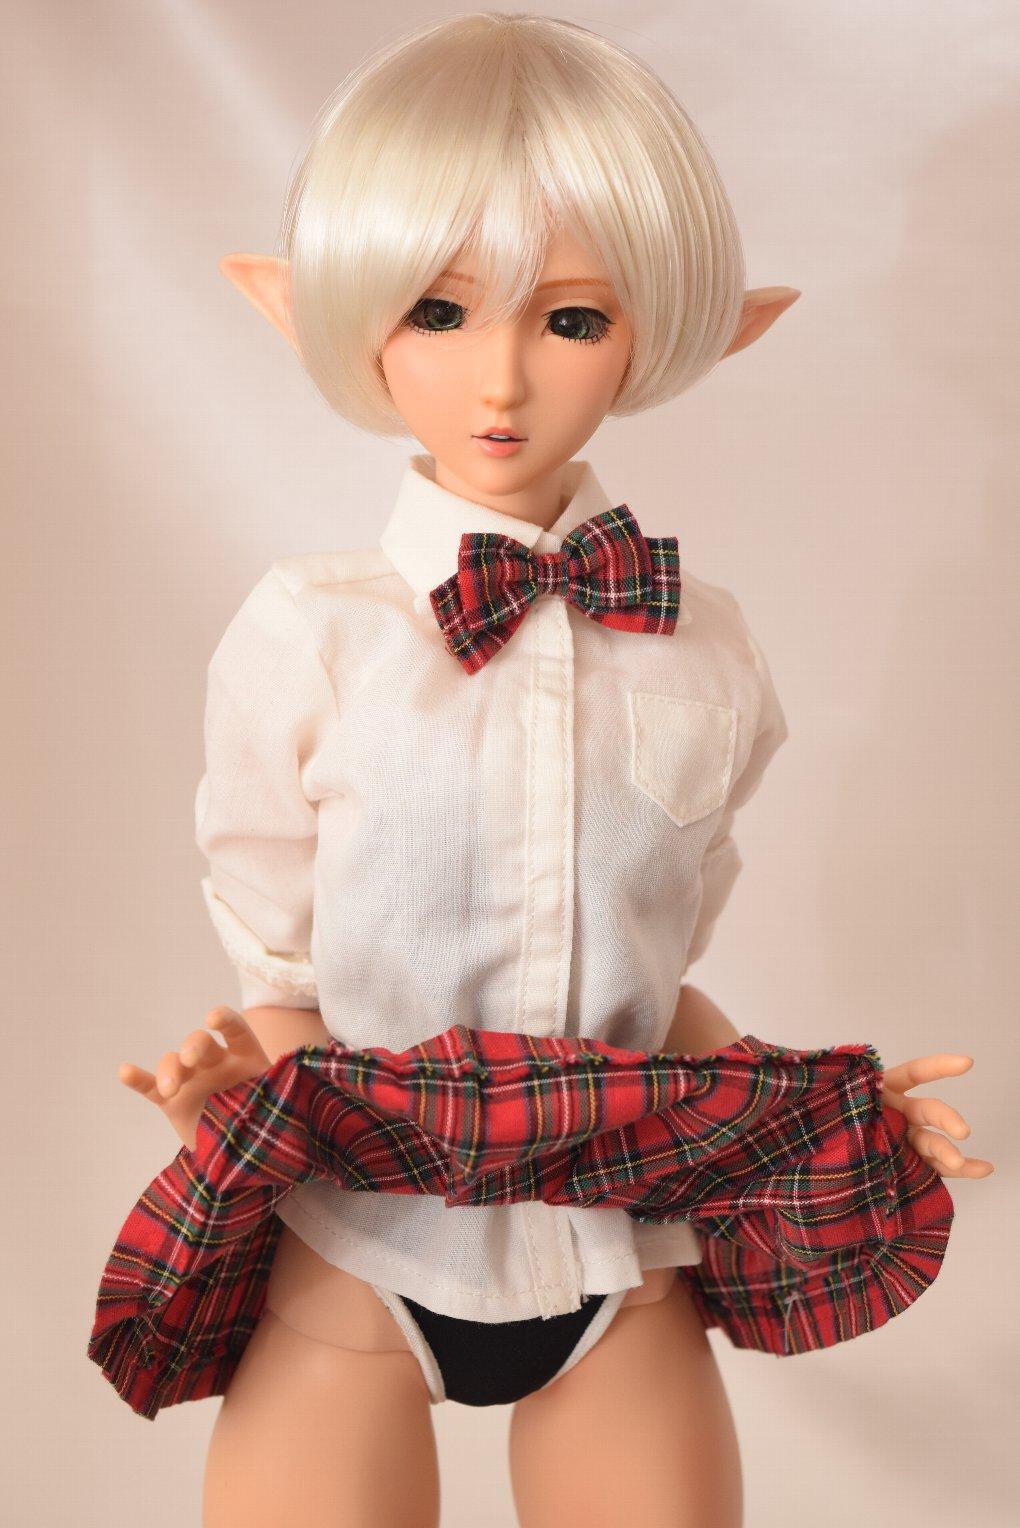 doll_3746.jpg